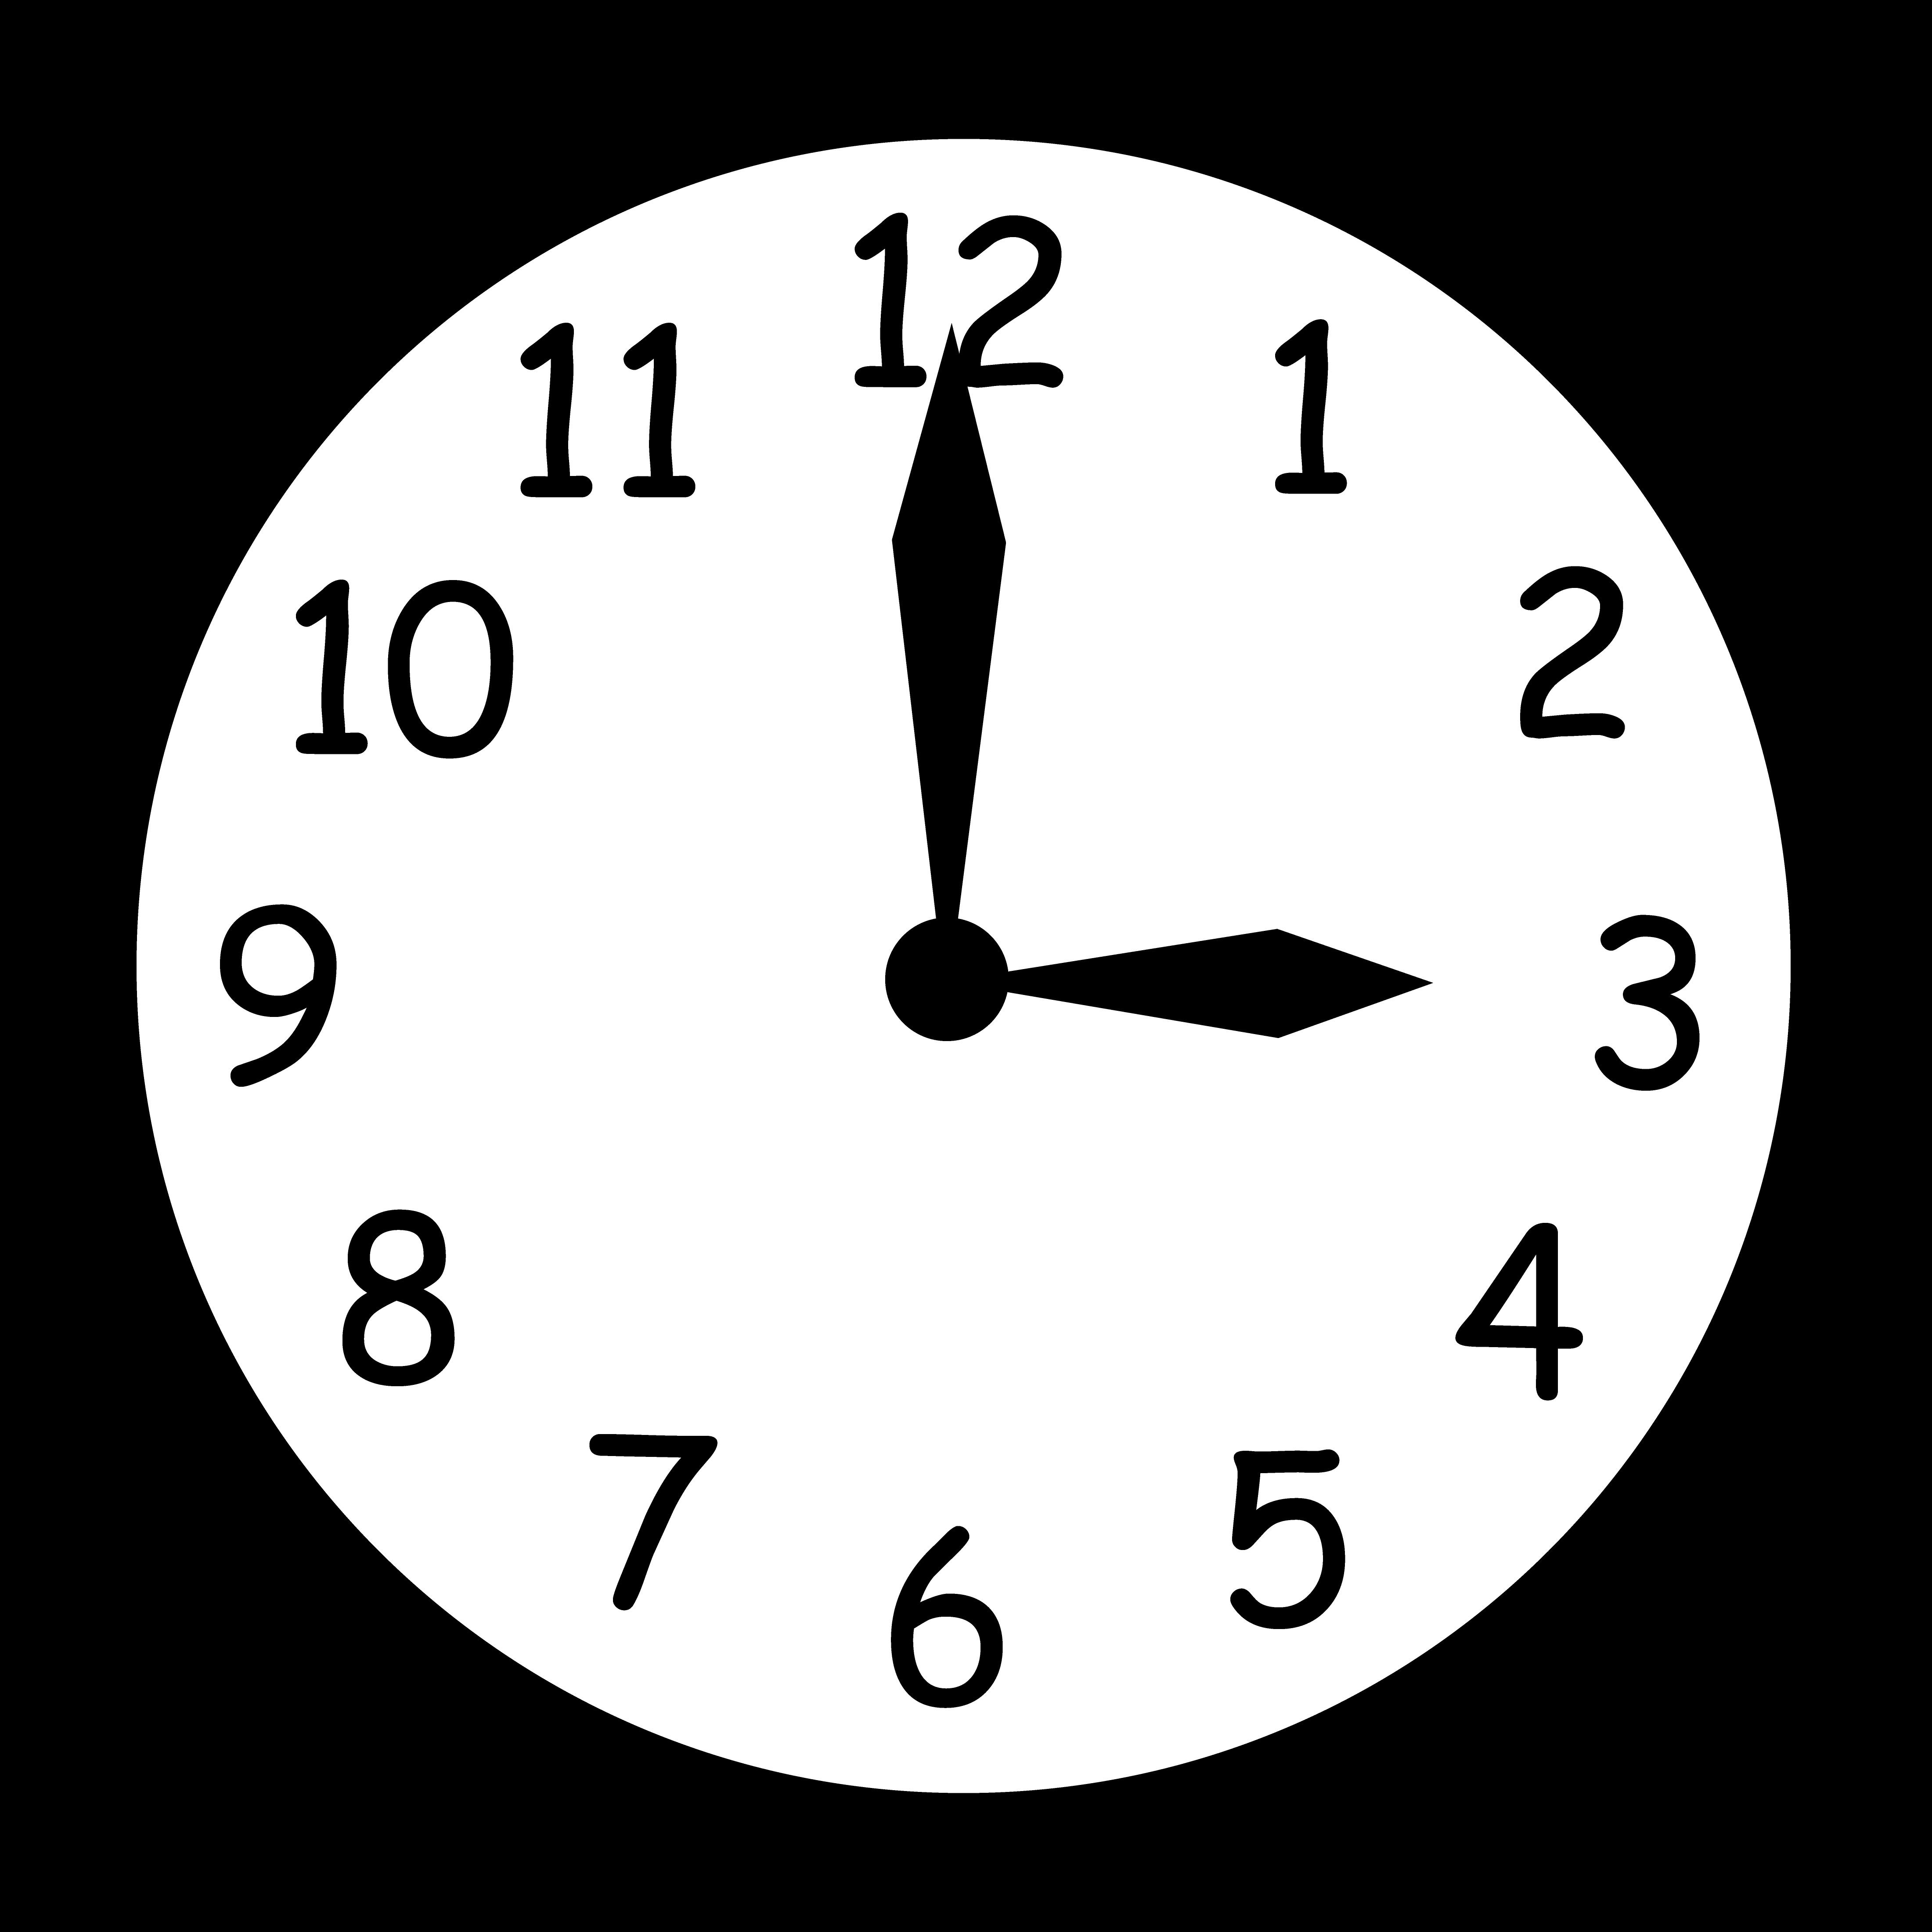 4400x4400 Clip Art Analogue Clock Clipart Panda